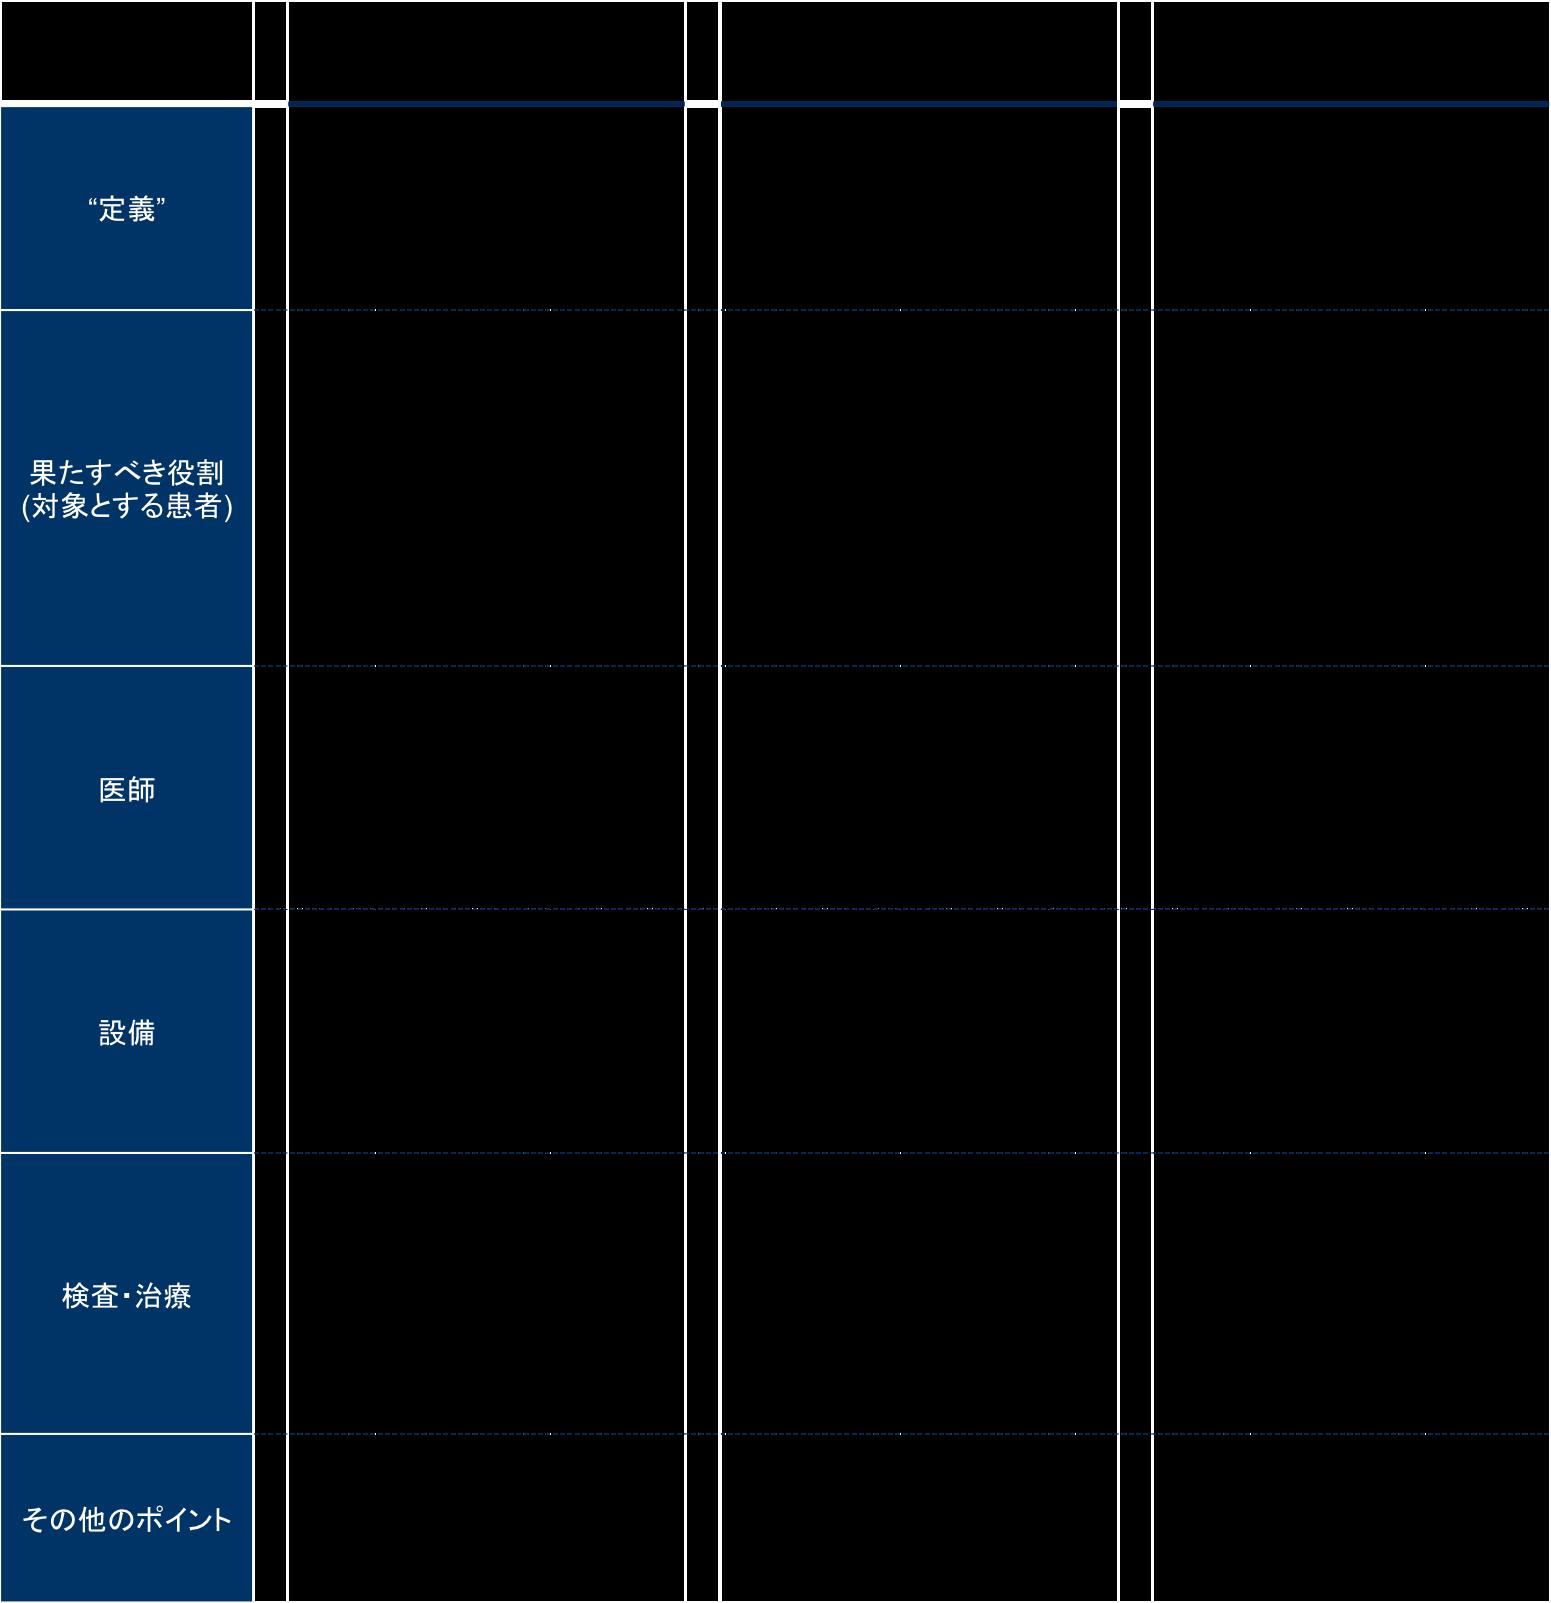 150909_hospital classification